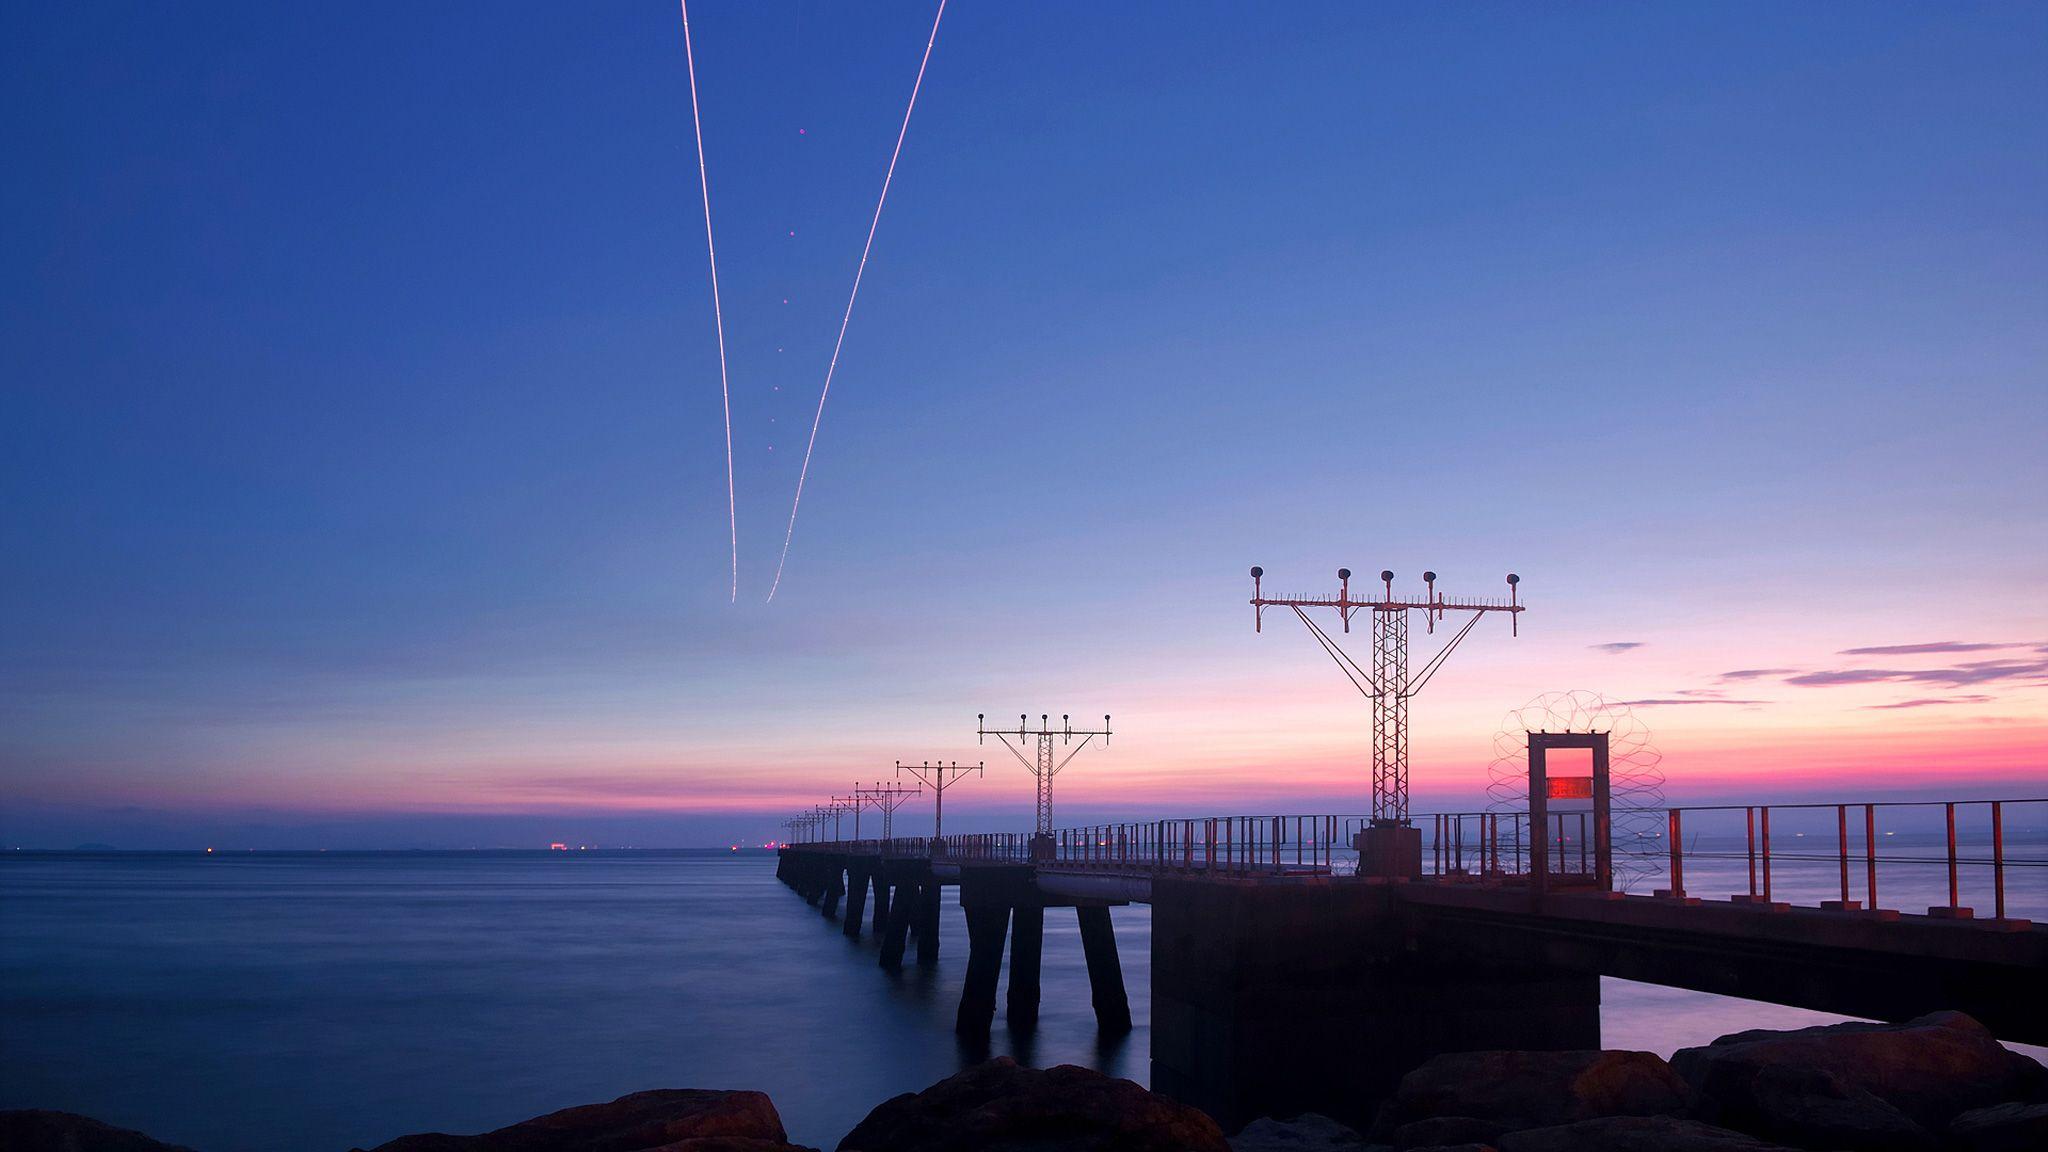 Pink Blue Sky 2048x1152 1080p, Fotos, Hd 1080p